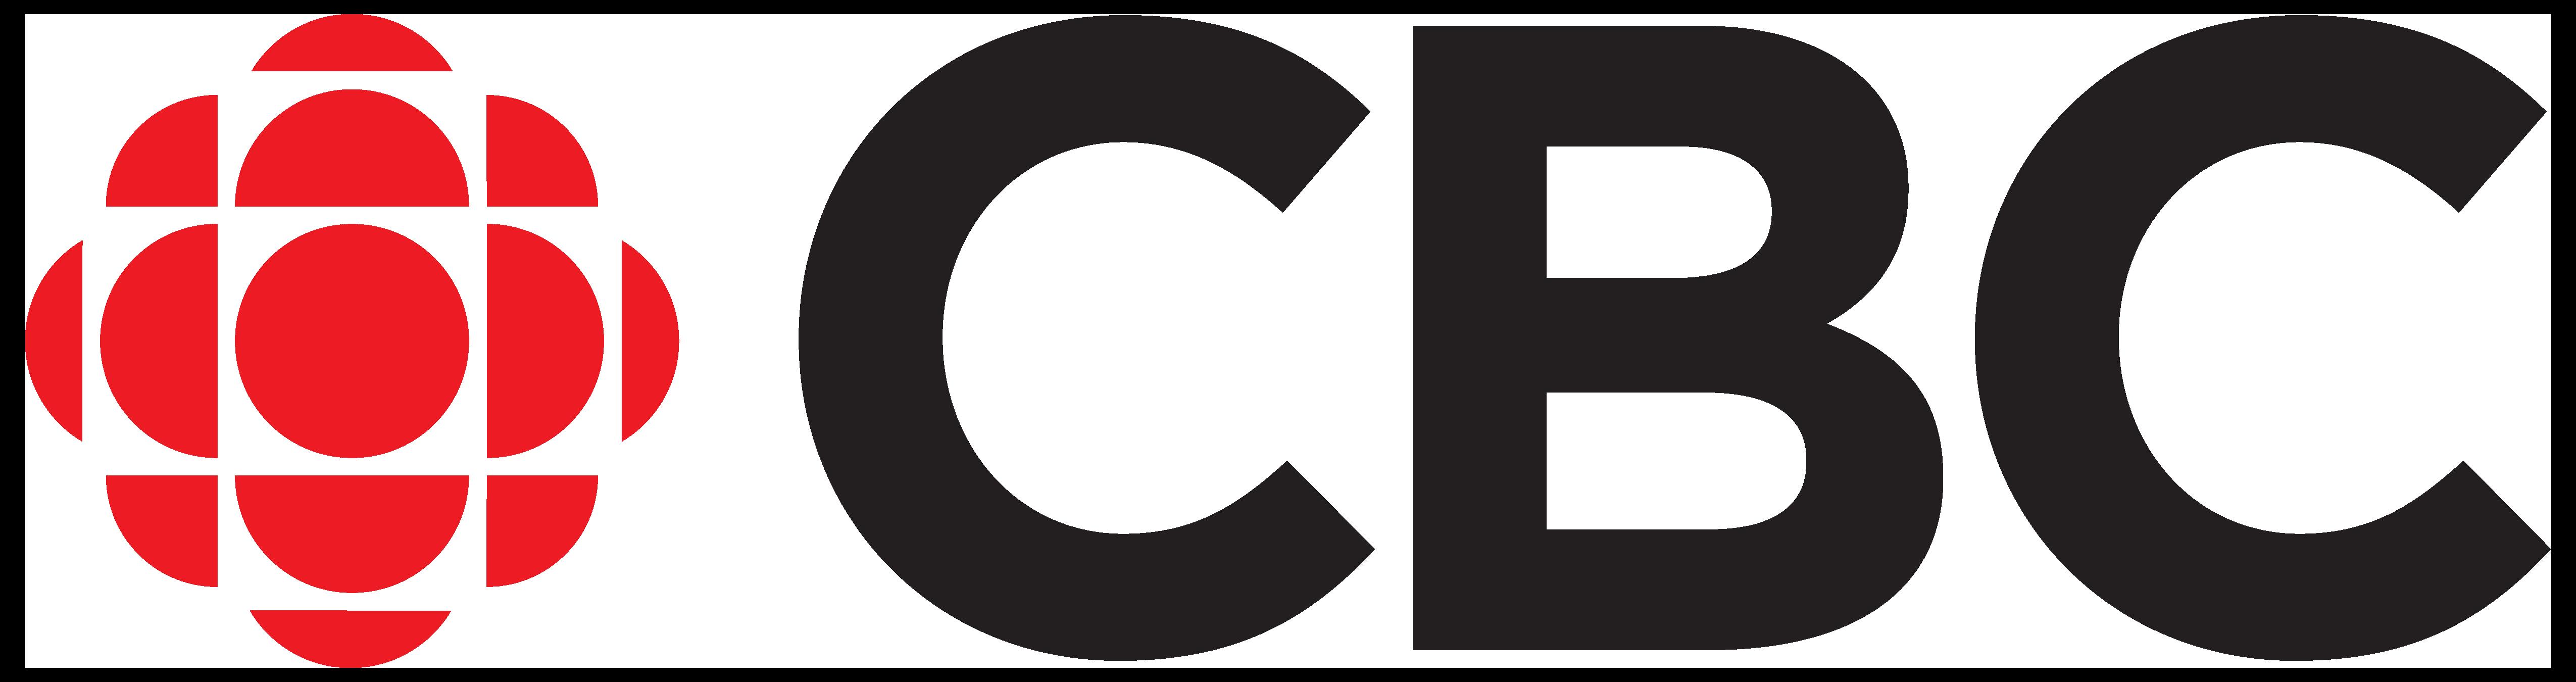 CBC Atlantic logo